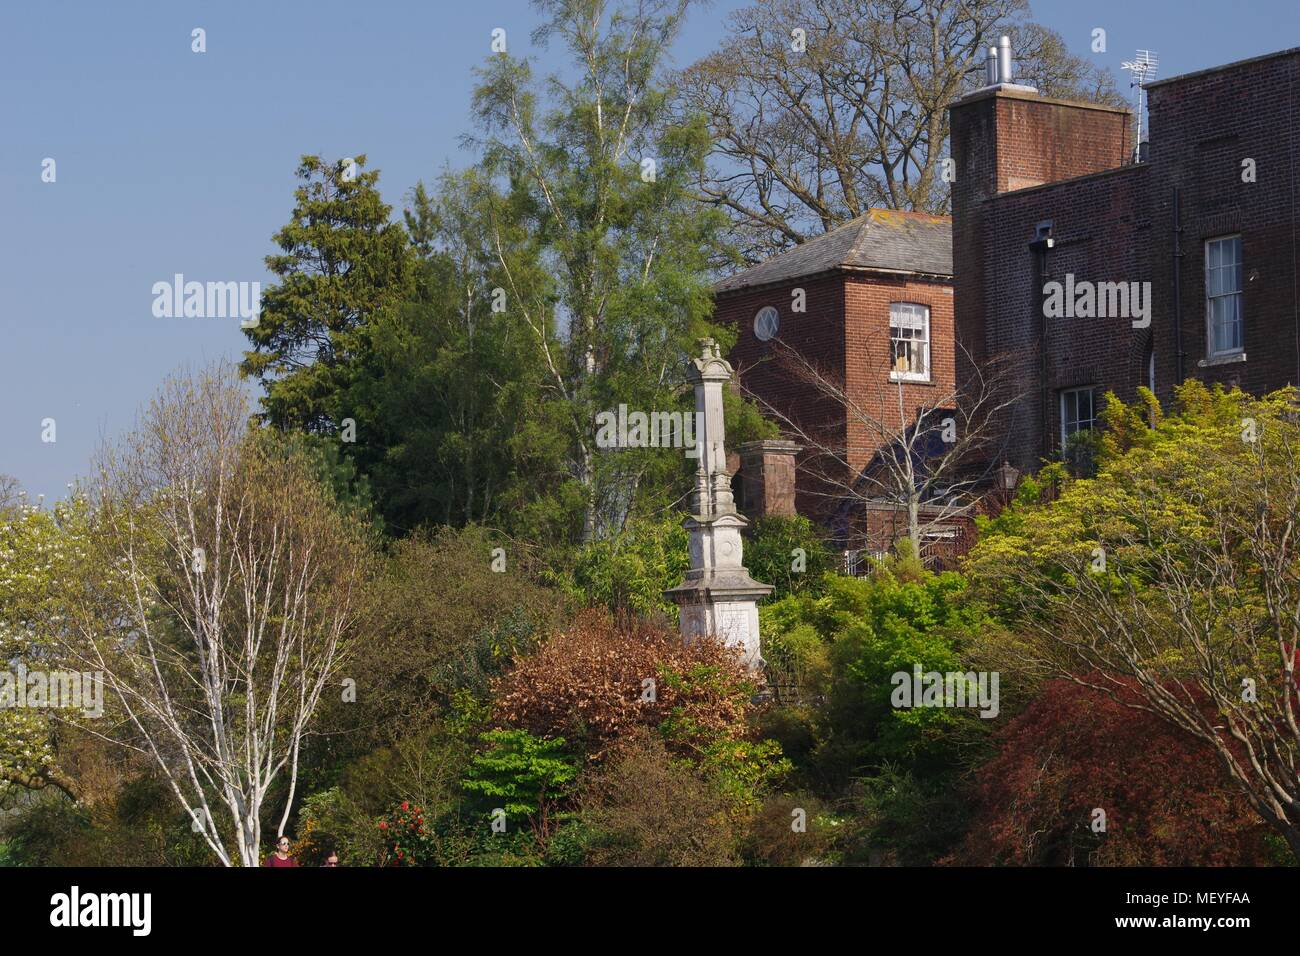 Rougemont Castle Northernhay Gardens Stock Photos & Rougemont Castle ...